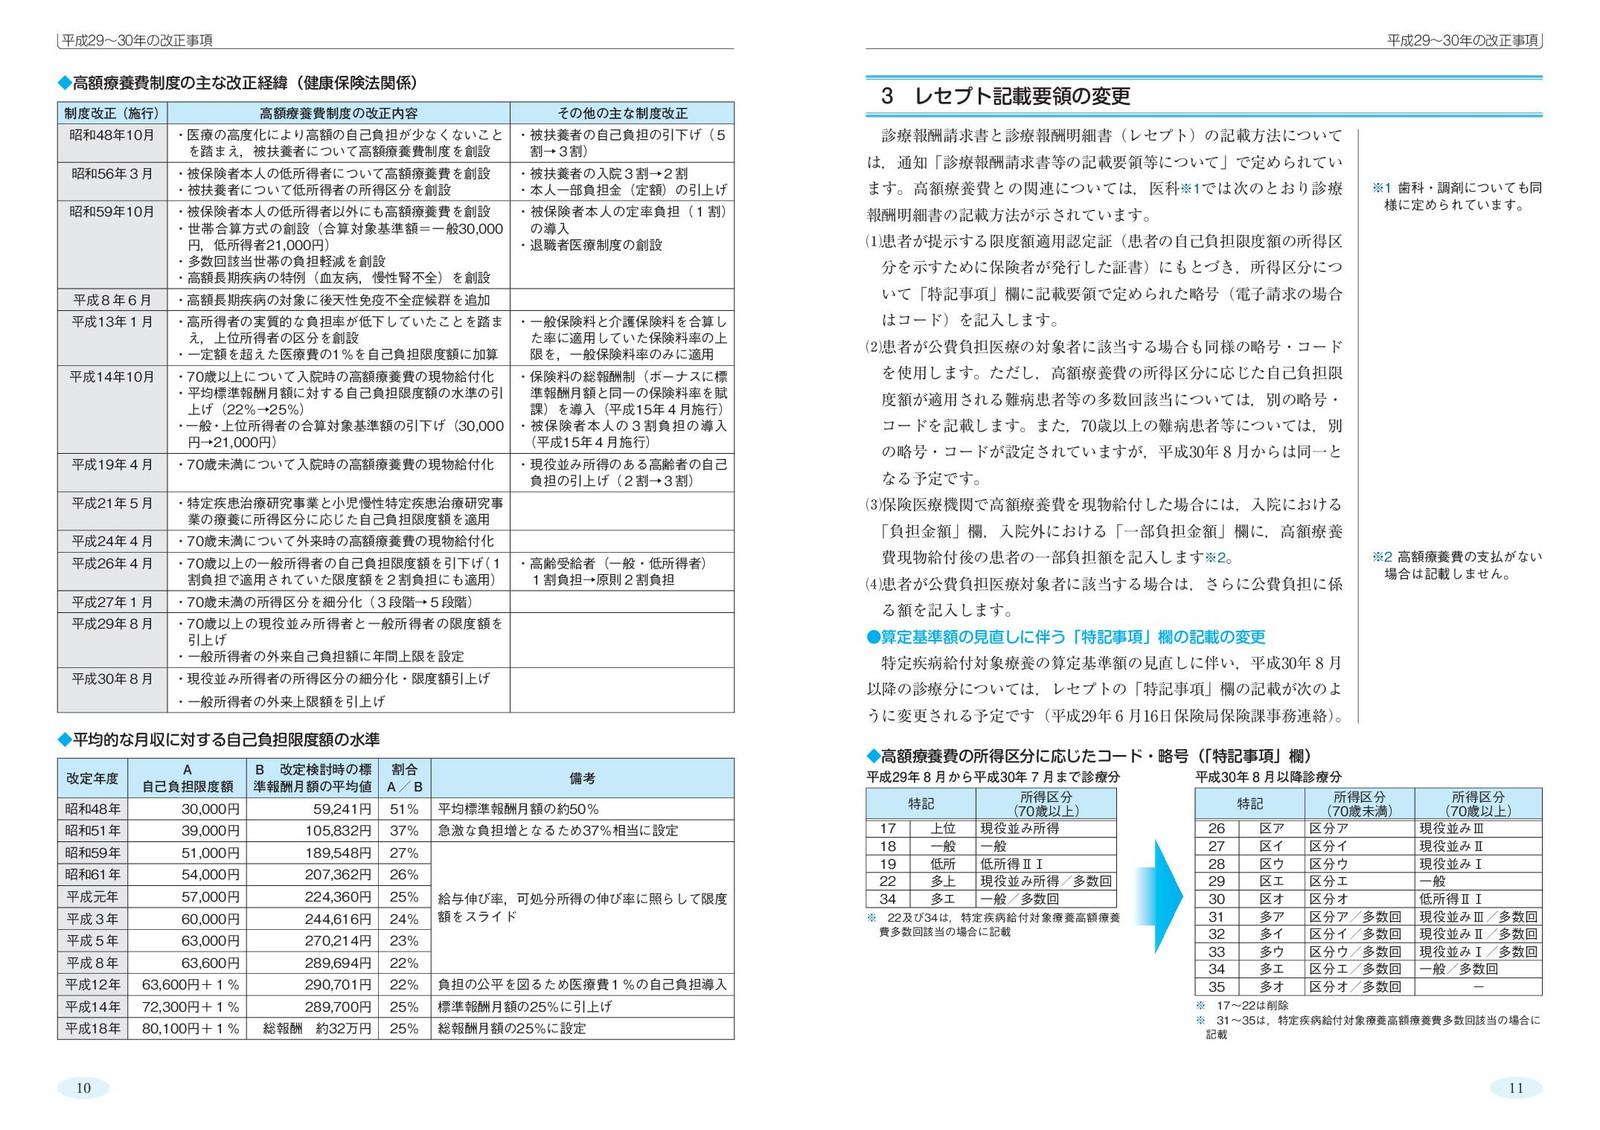 医療・介護 高額ガイド 平成29年版